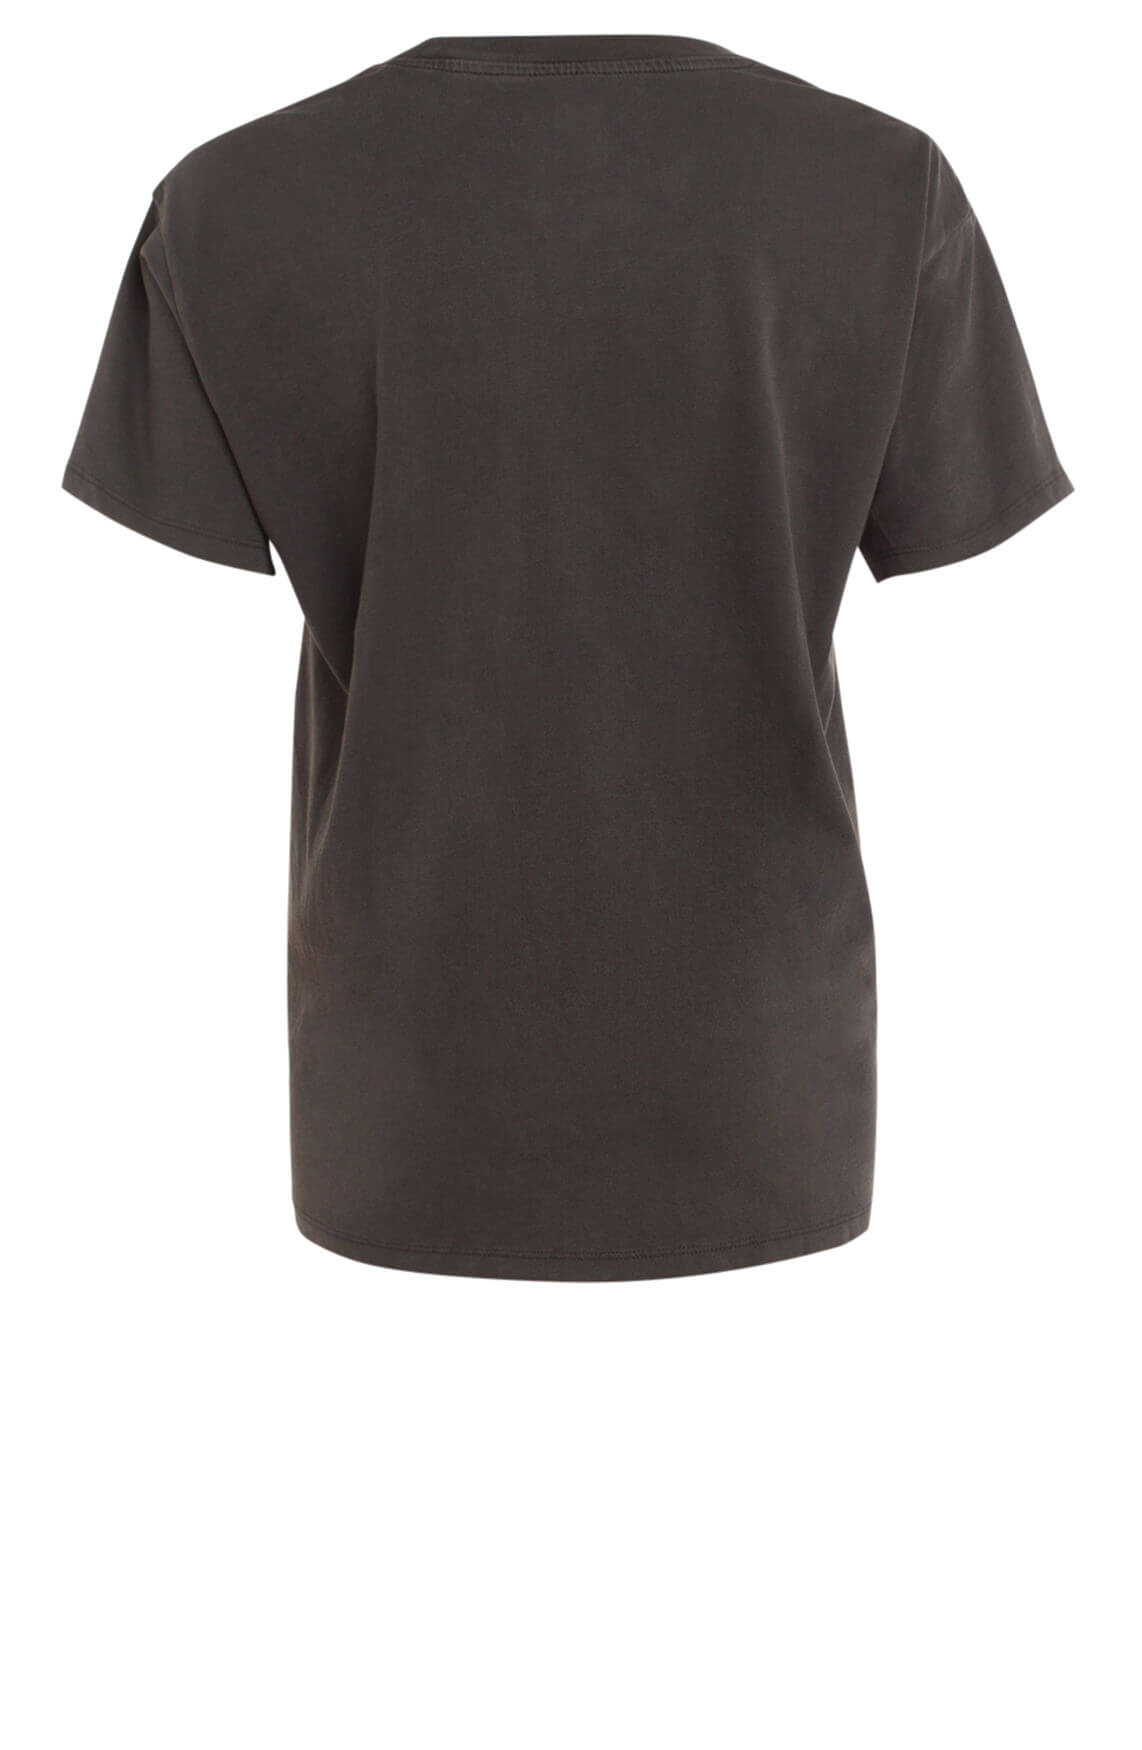 Levi s Dames Shirt met pailletten Grijs